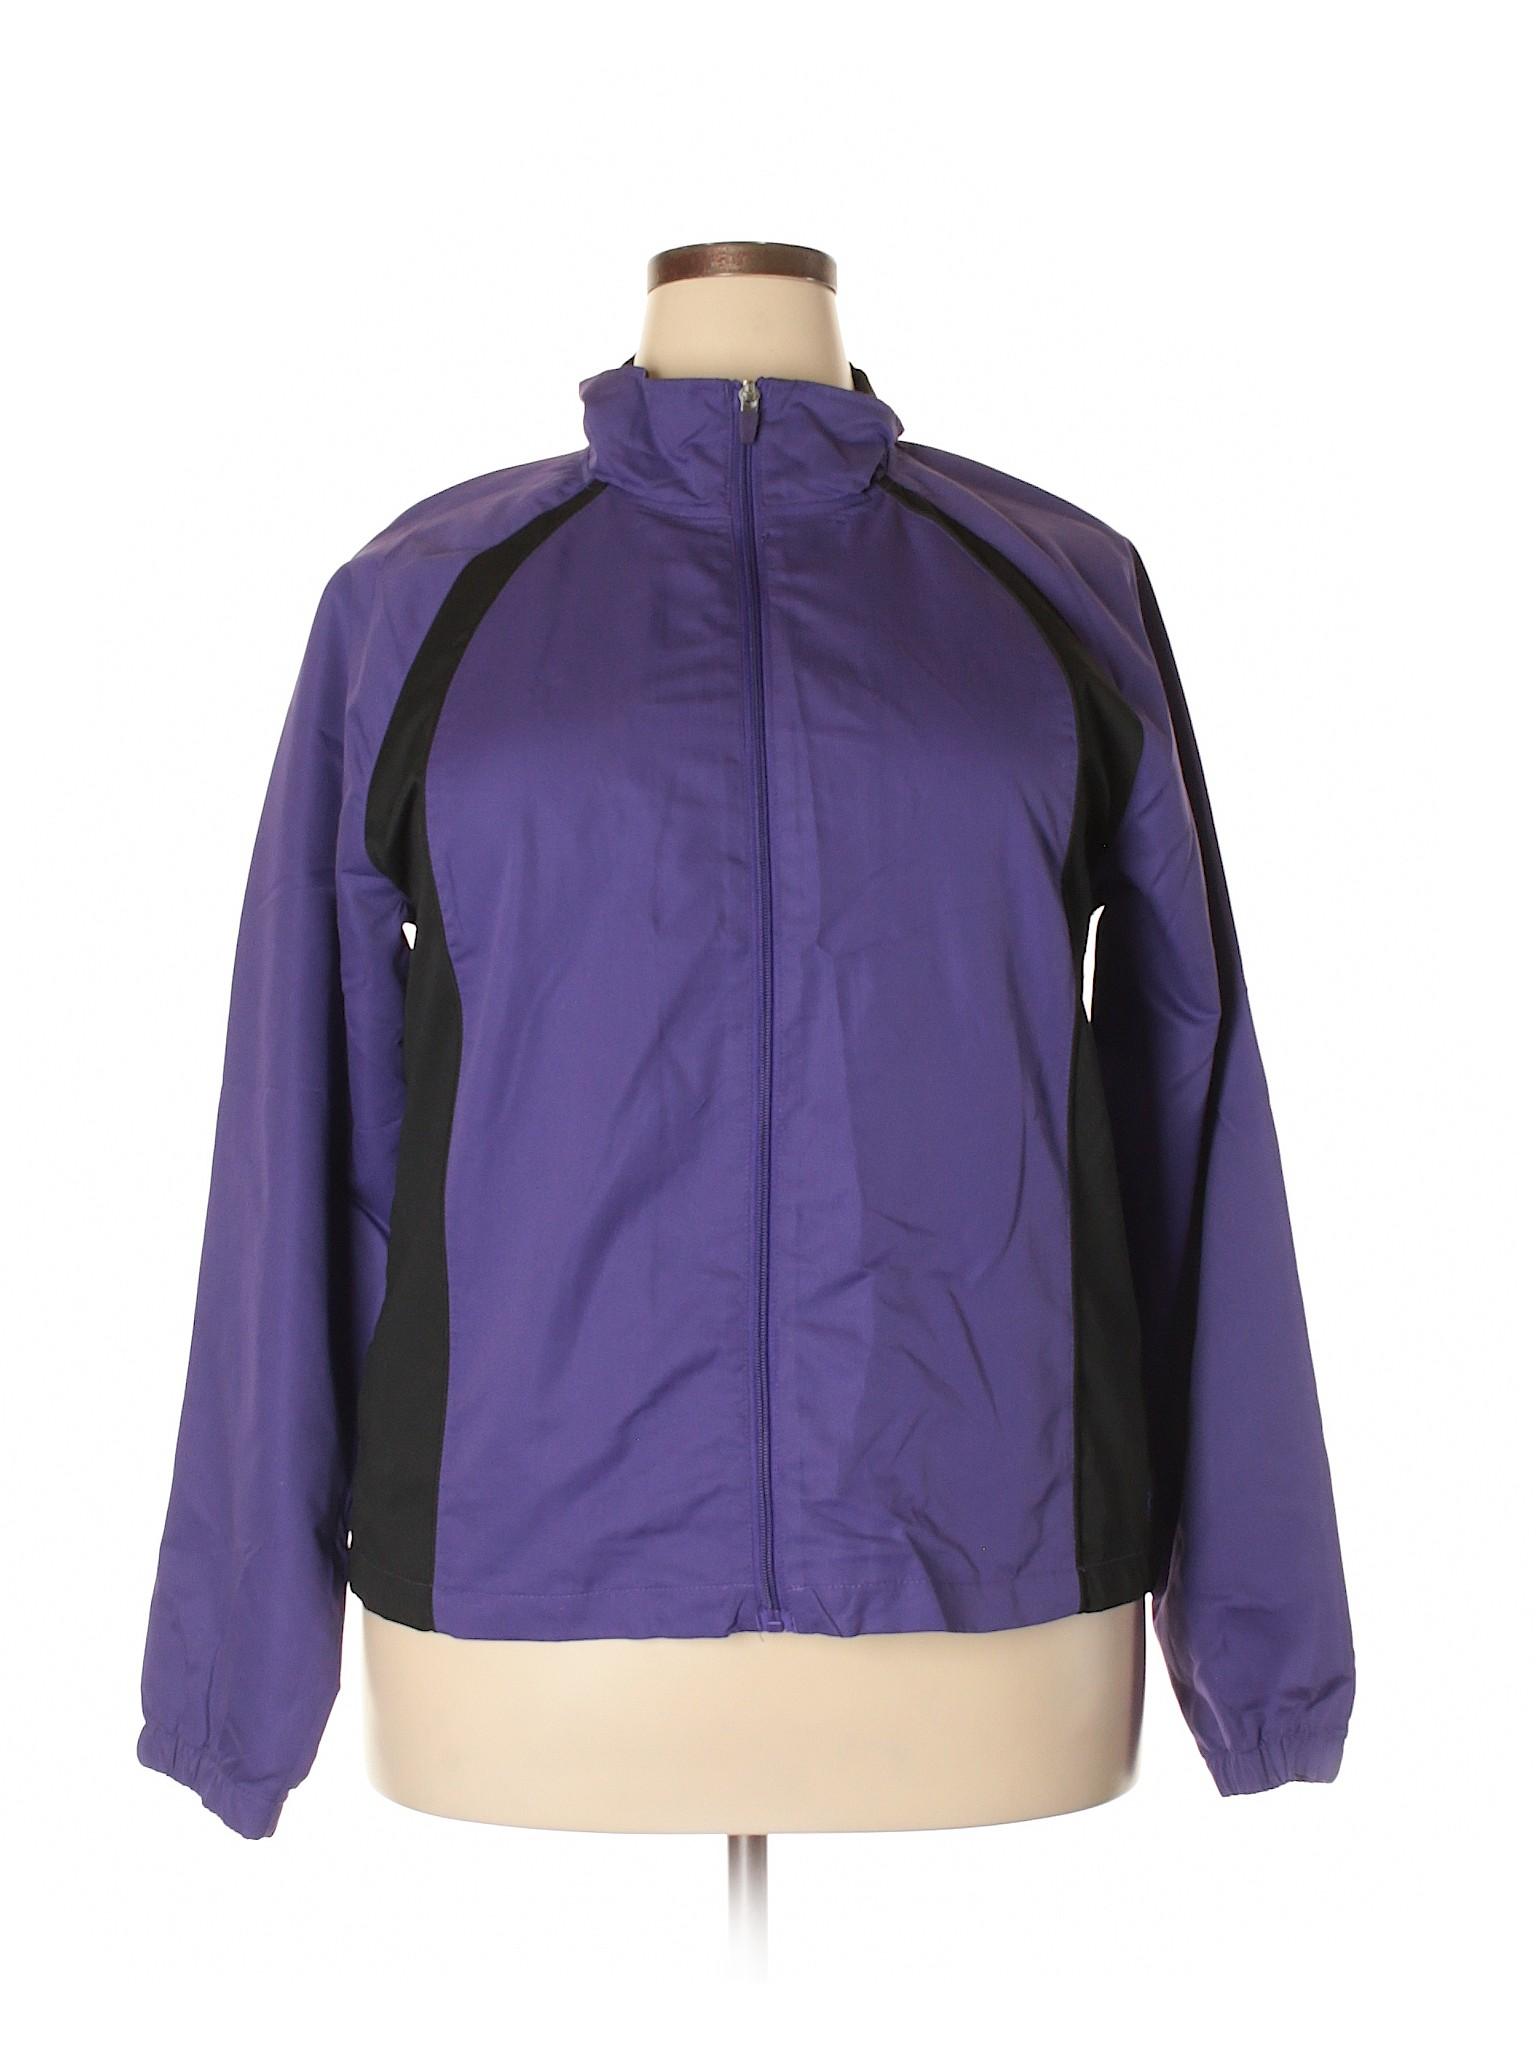 Jacket winter winter Jacket winter Boutique Boutique winter Danskin Danskin Danskin Jacket Danskin Boutique Boutique qwnAfxUH1